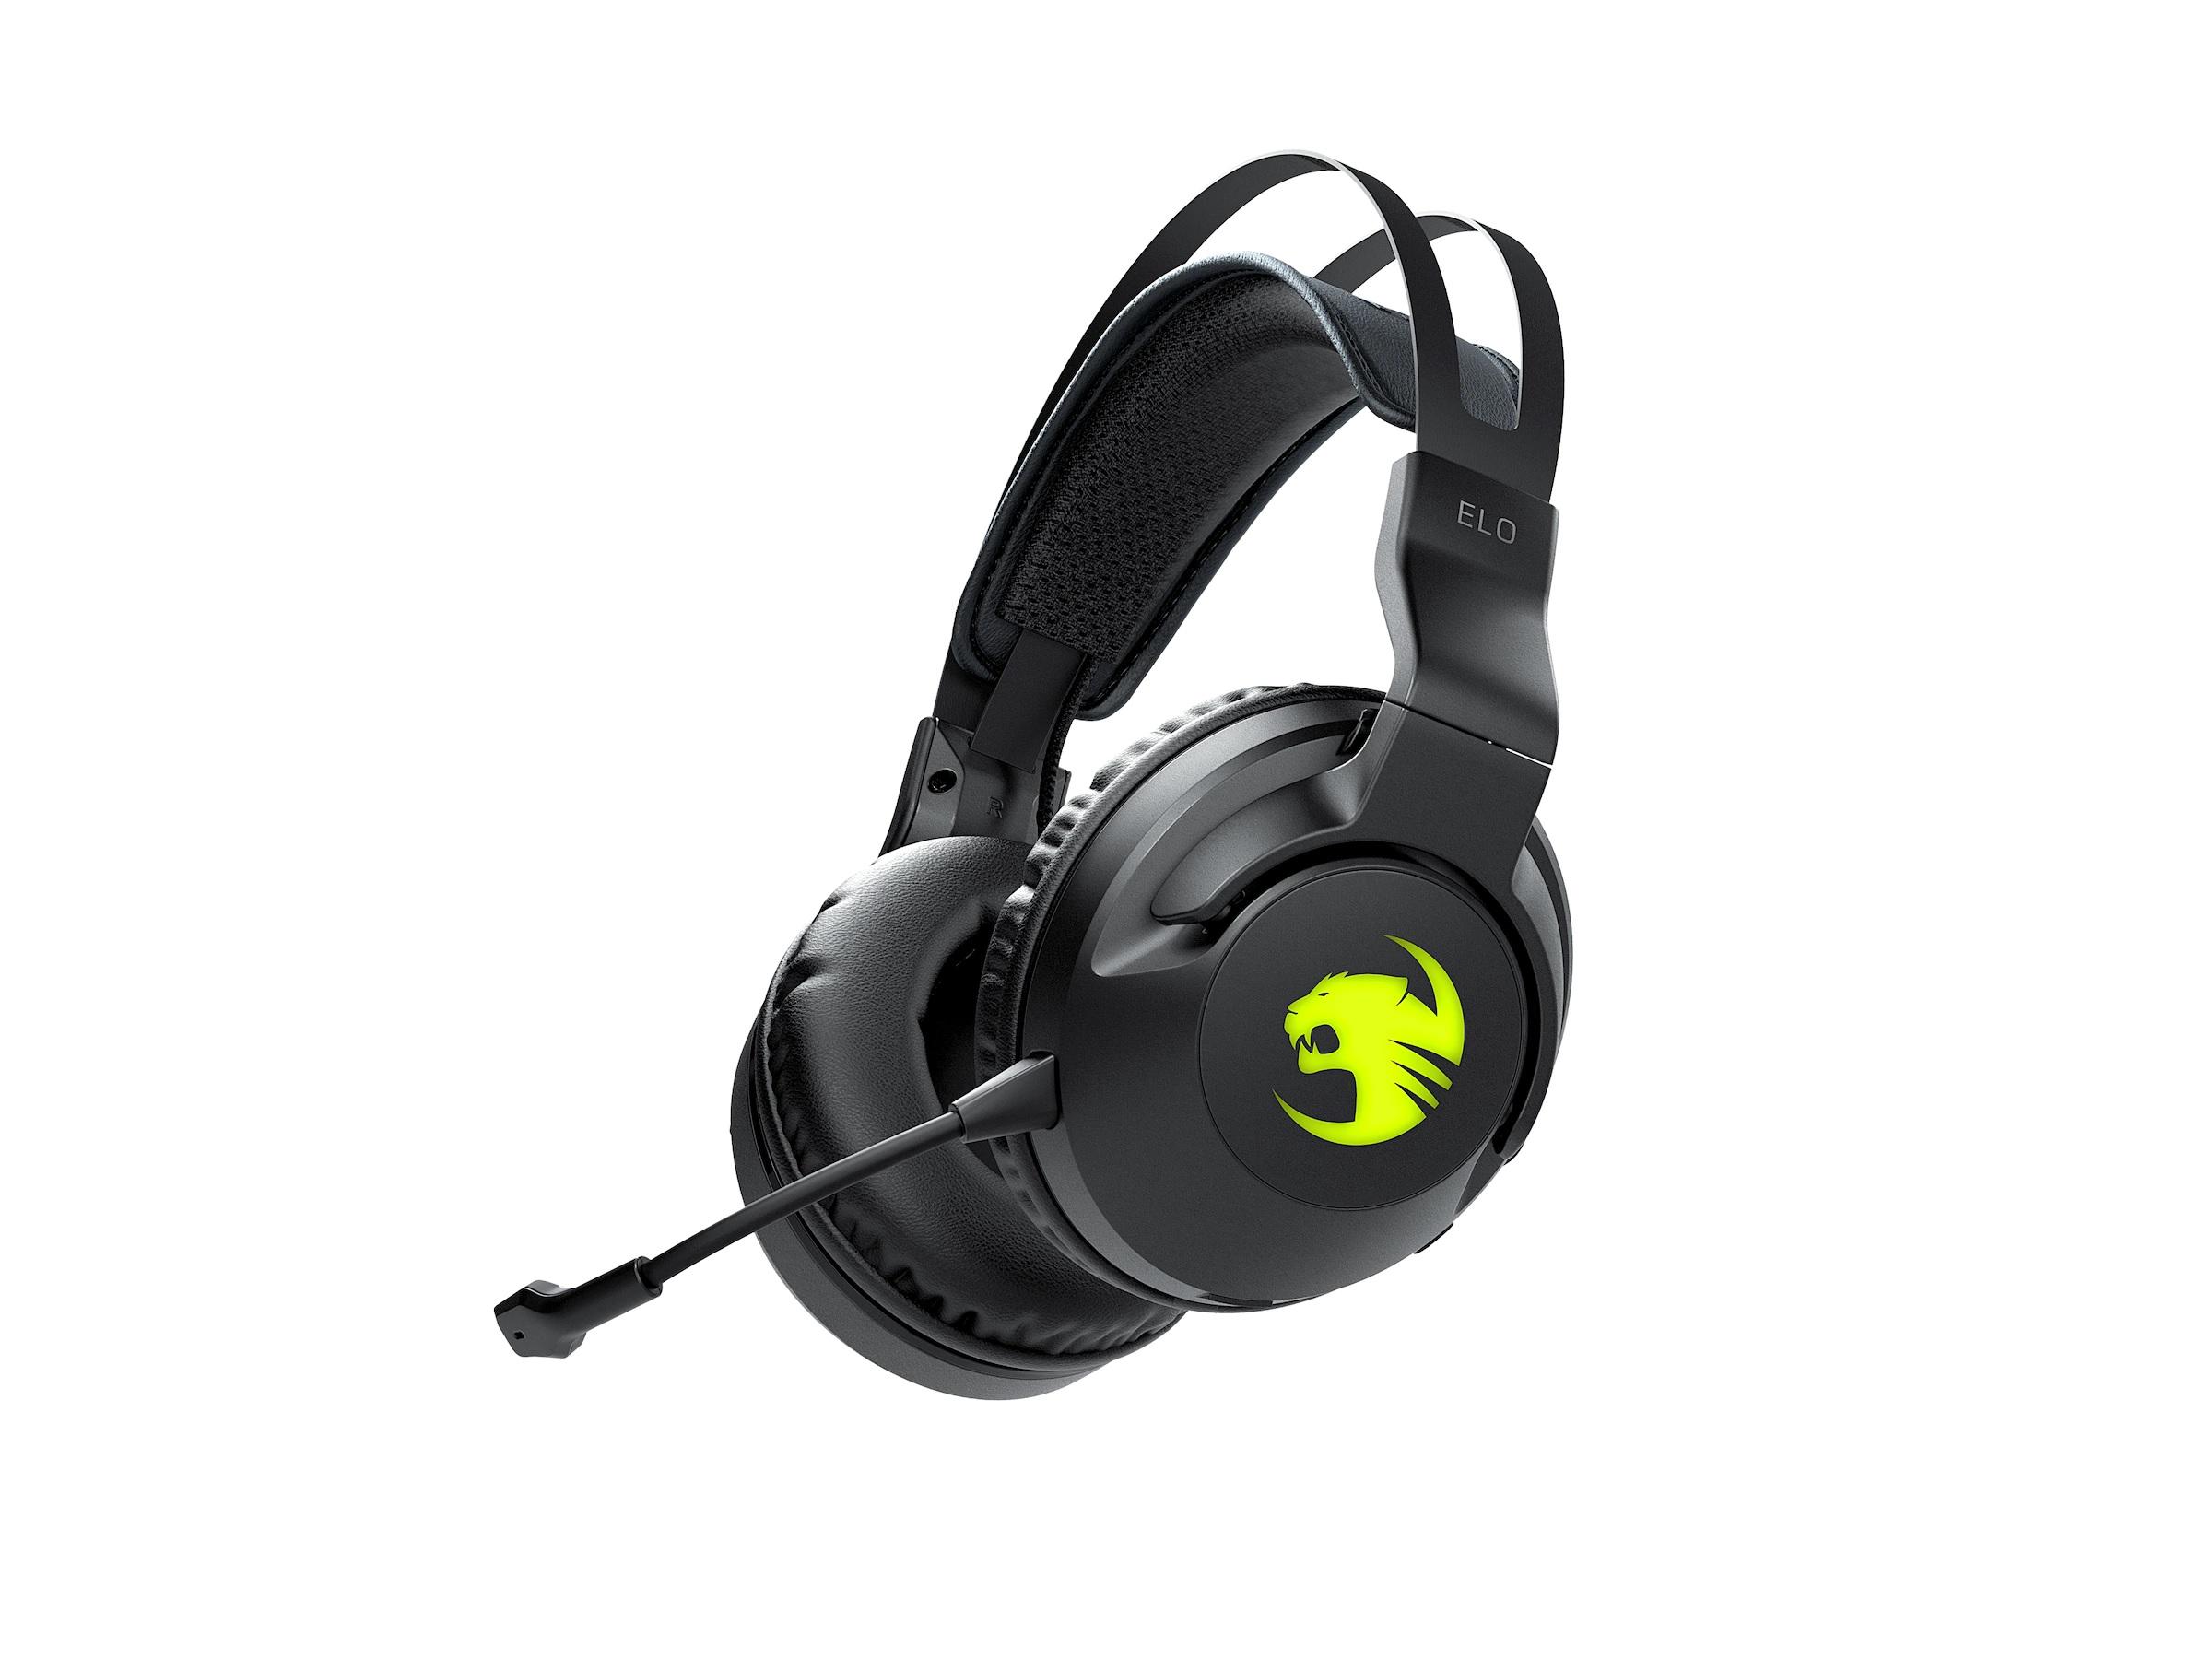 Roccat ELO 7.1 AIR trådlös gaming headset